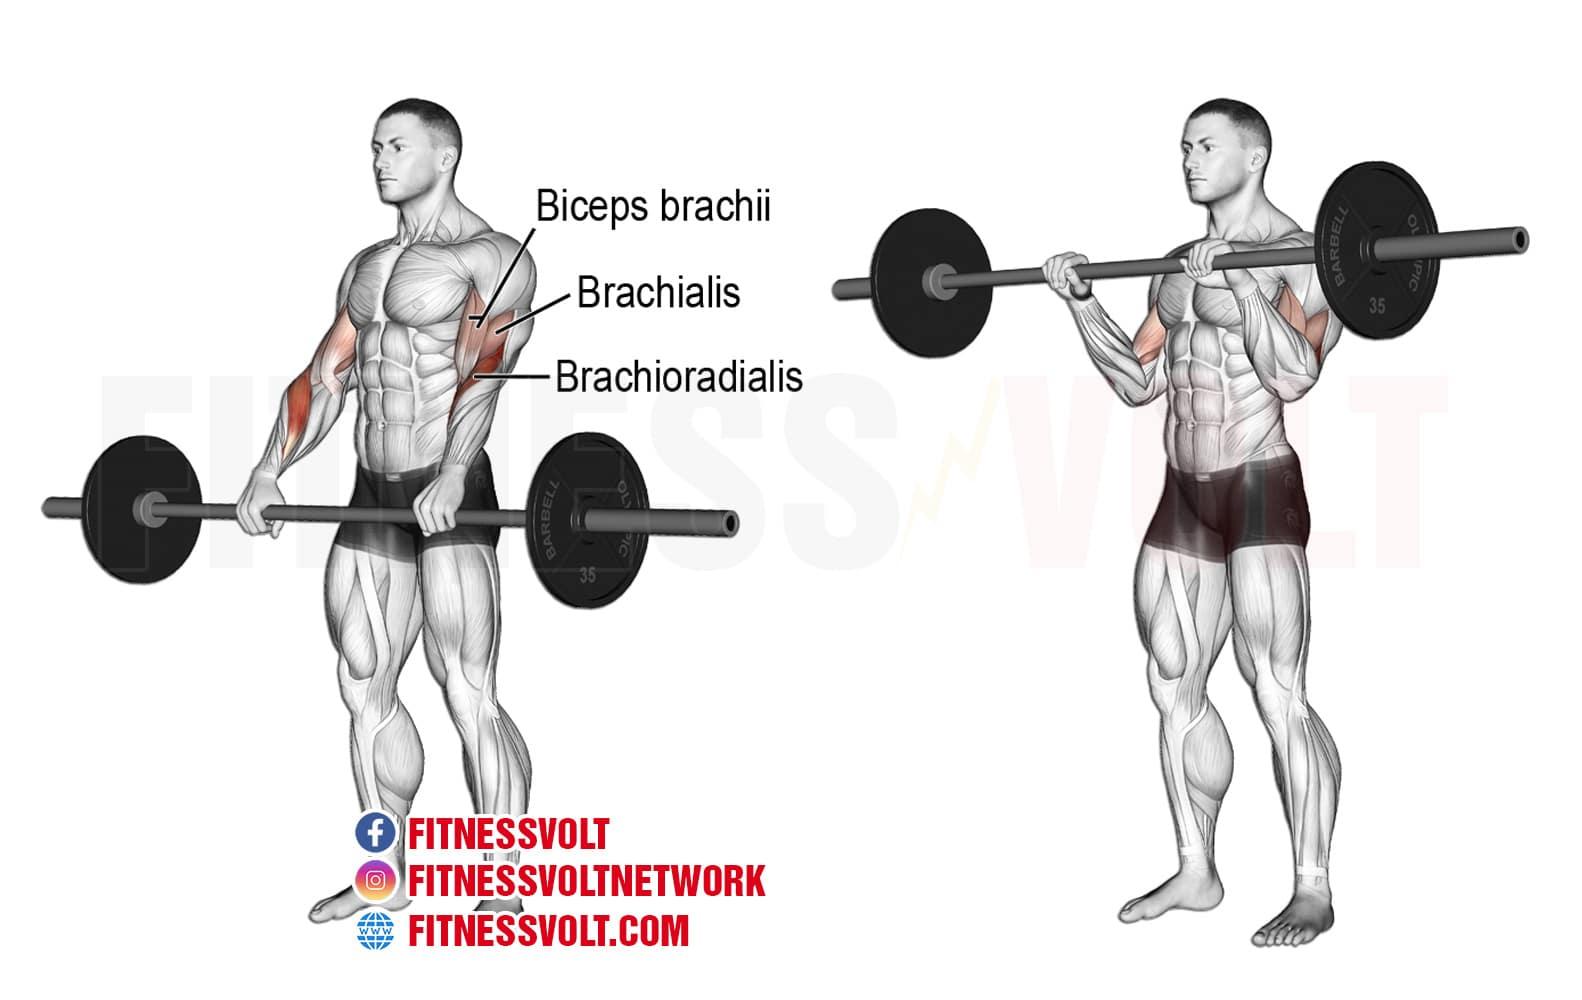 Barbell Reverse Curl (Brachioradialis, Brachialis, Biceps) – Fitness Volt